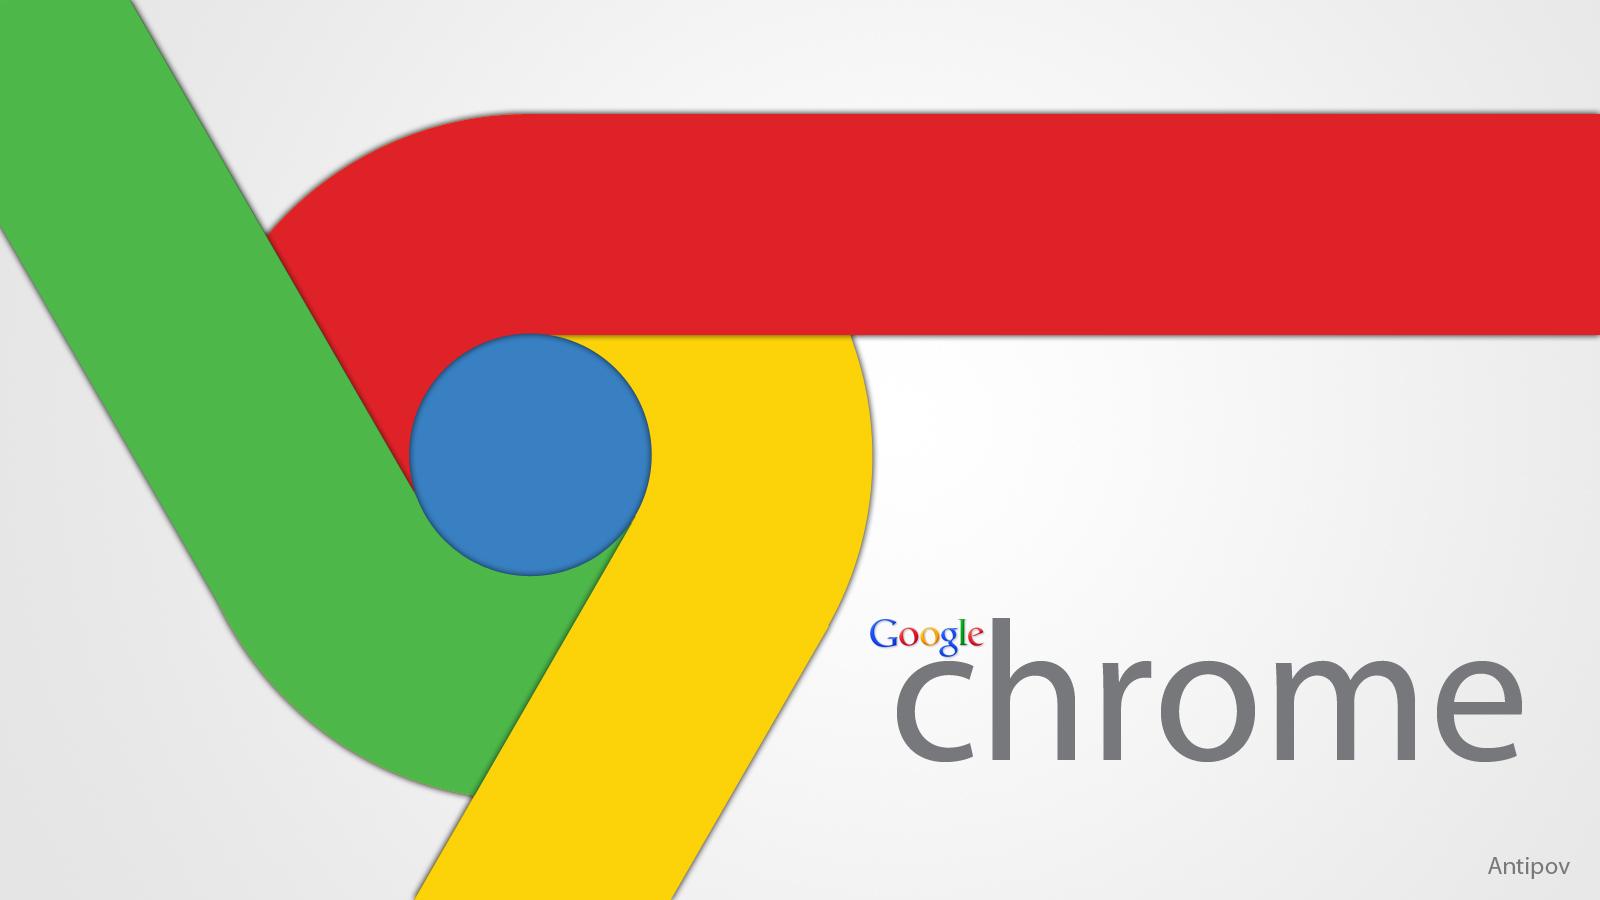 ... google-chrome-wallpaper-hd ...